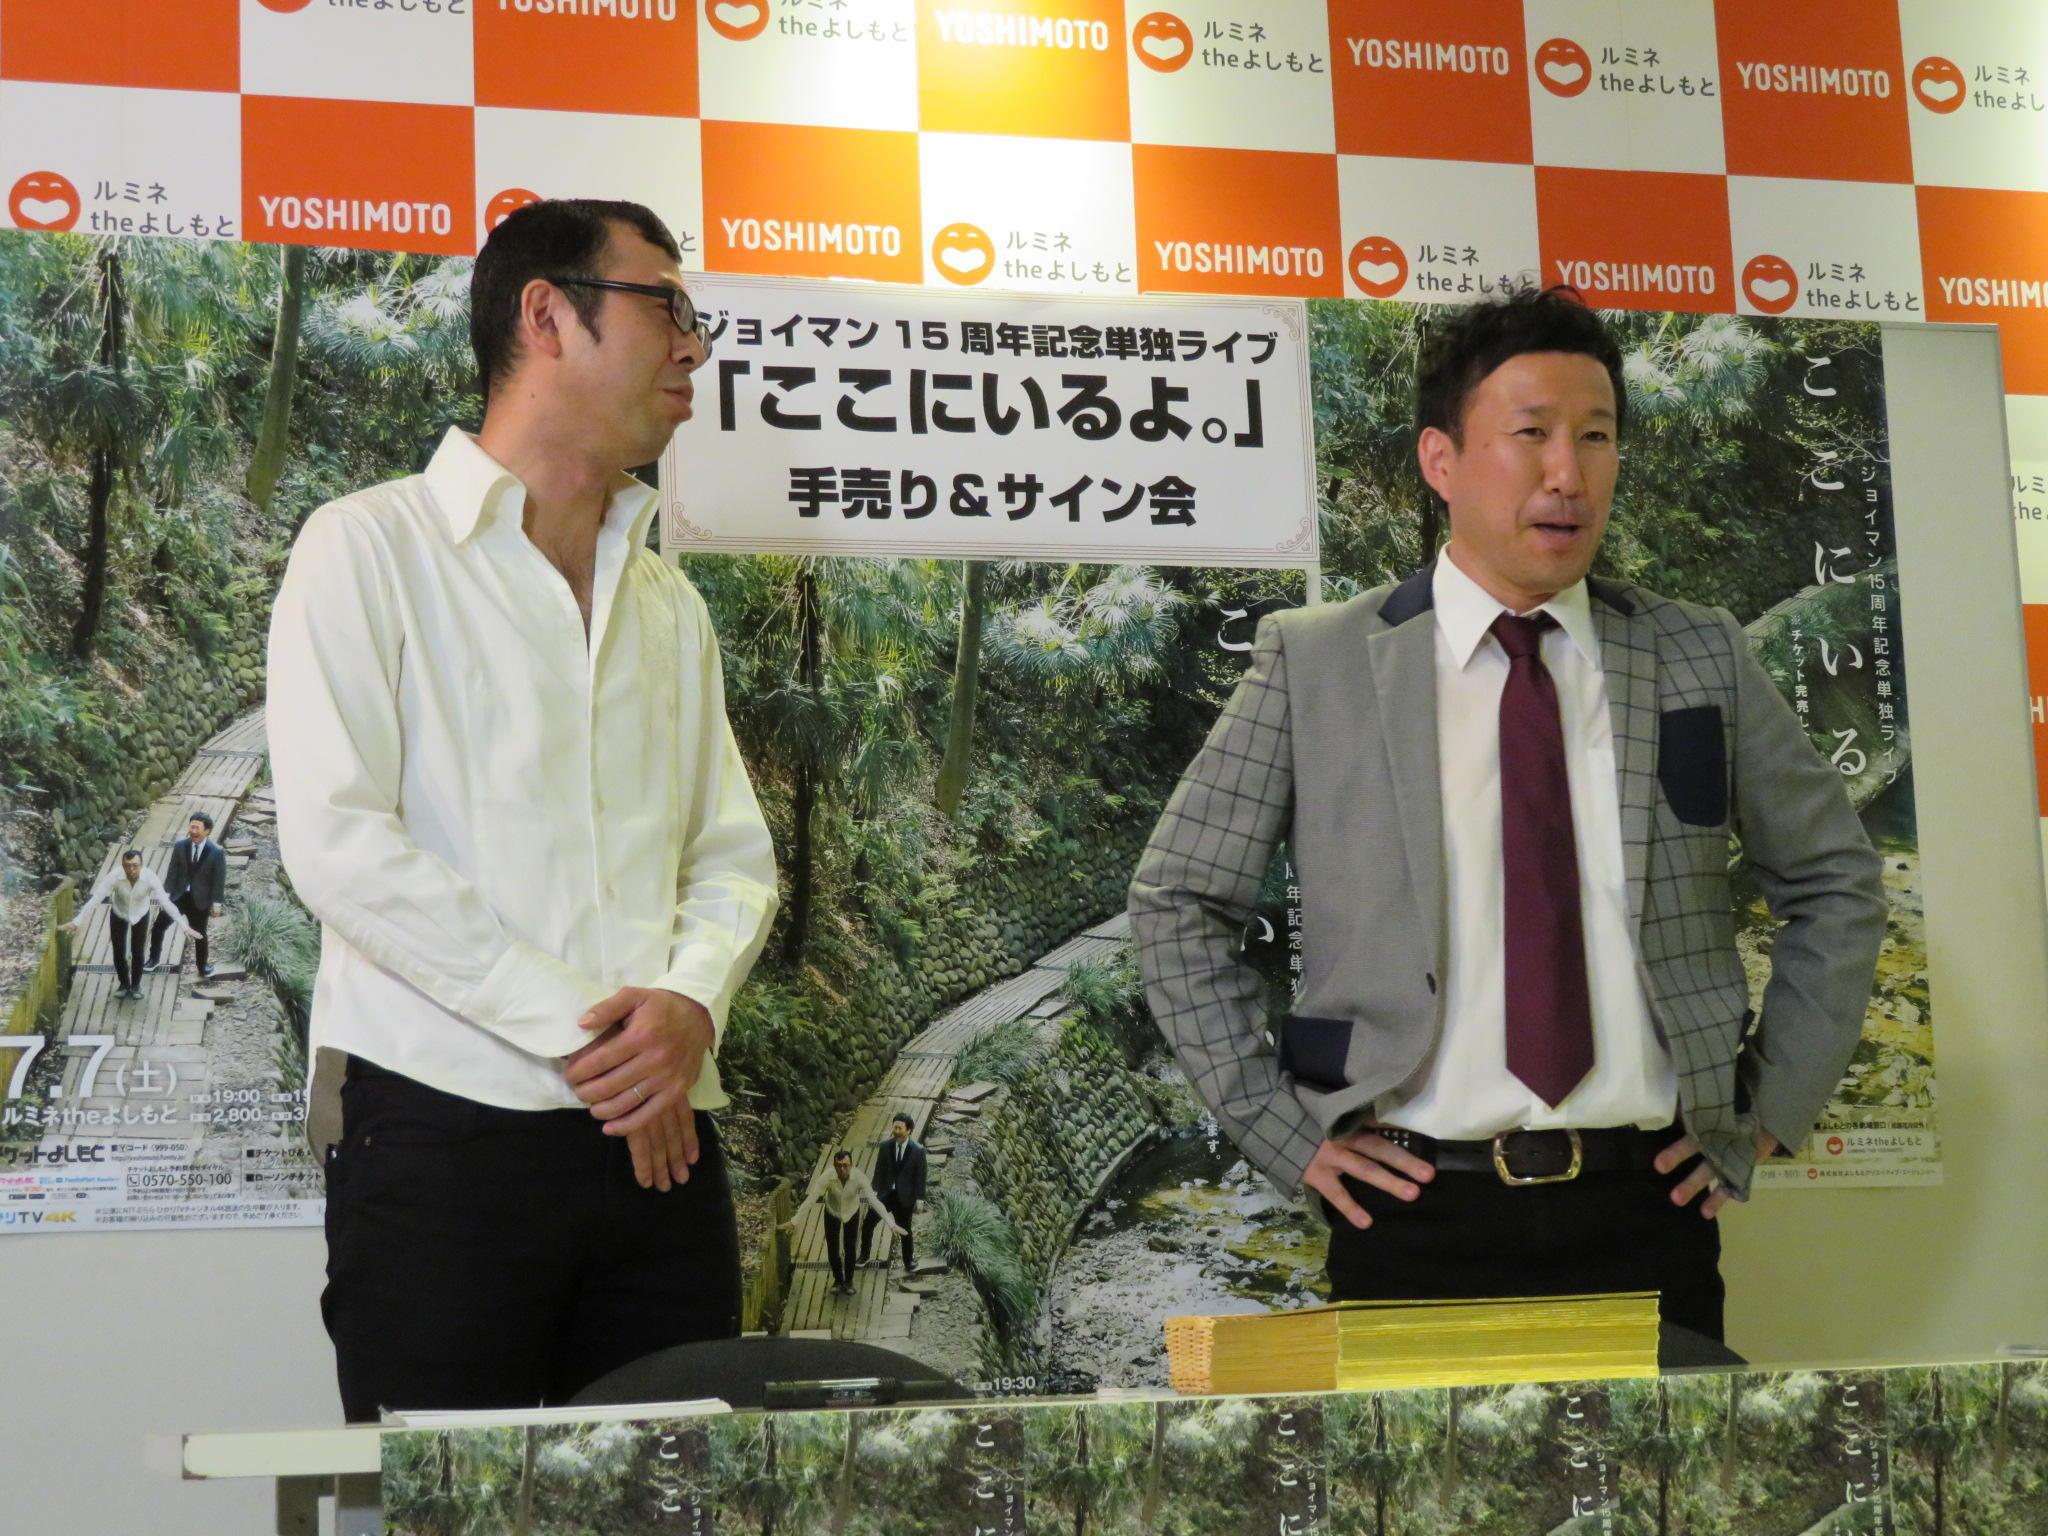 http://news.yoshimoto.co.jp/20180515003839-306345939fde87babece57caf8509390cae425b6.jpg